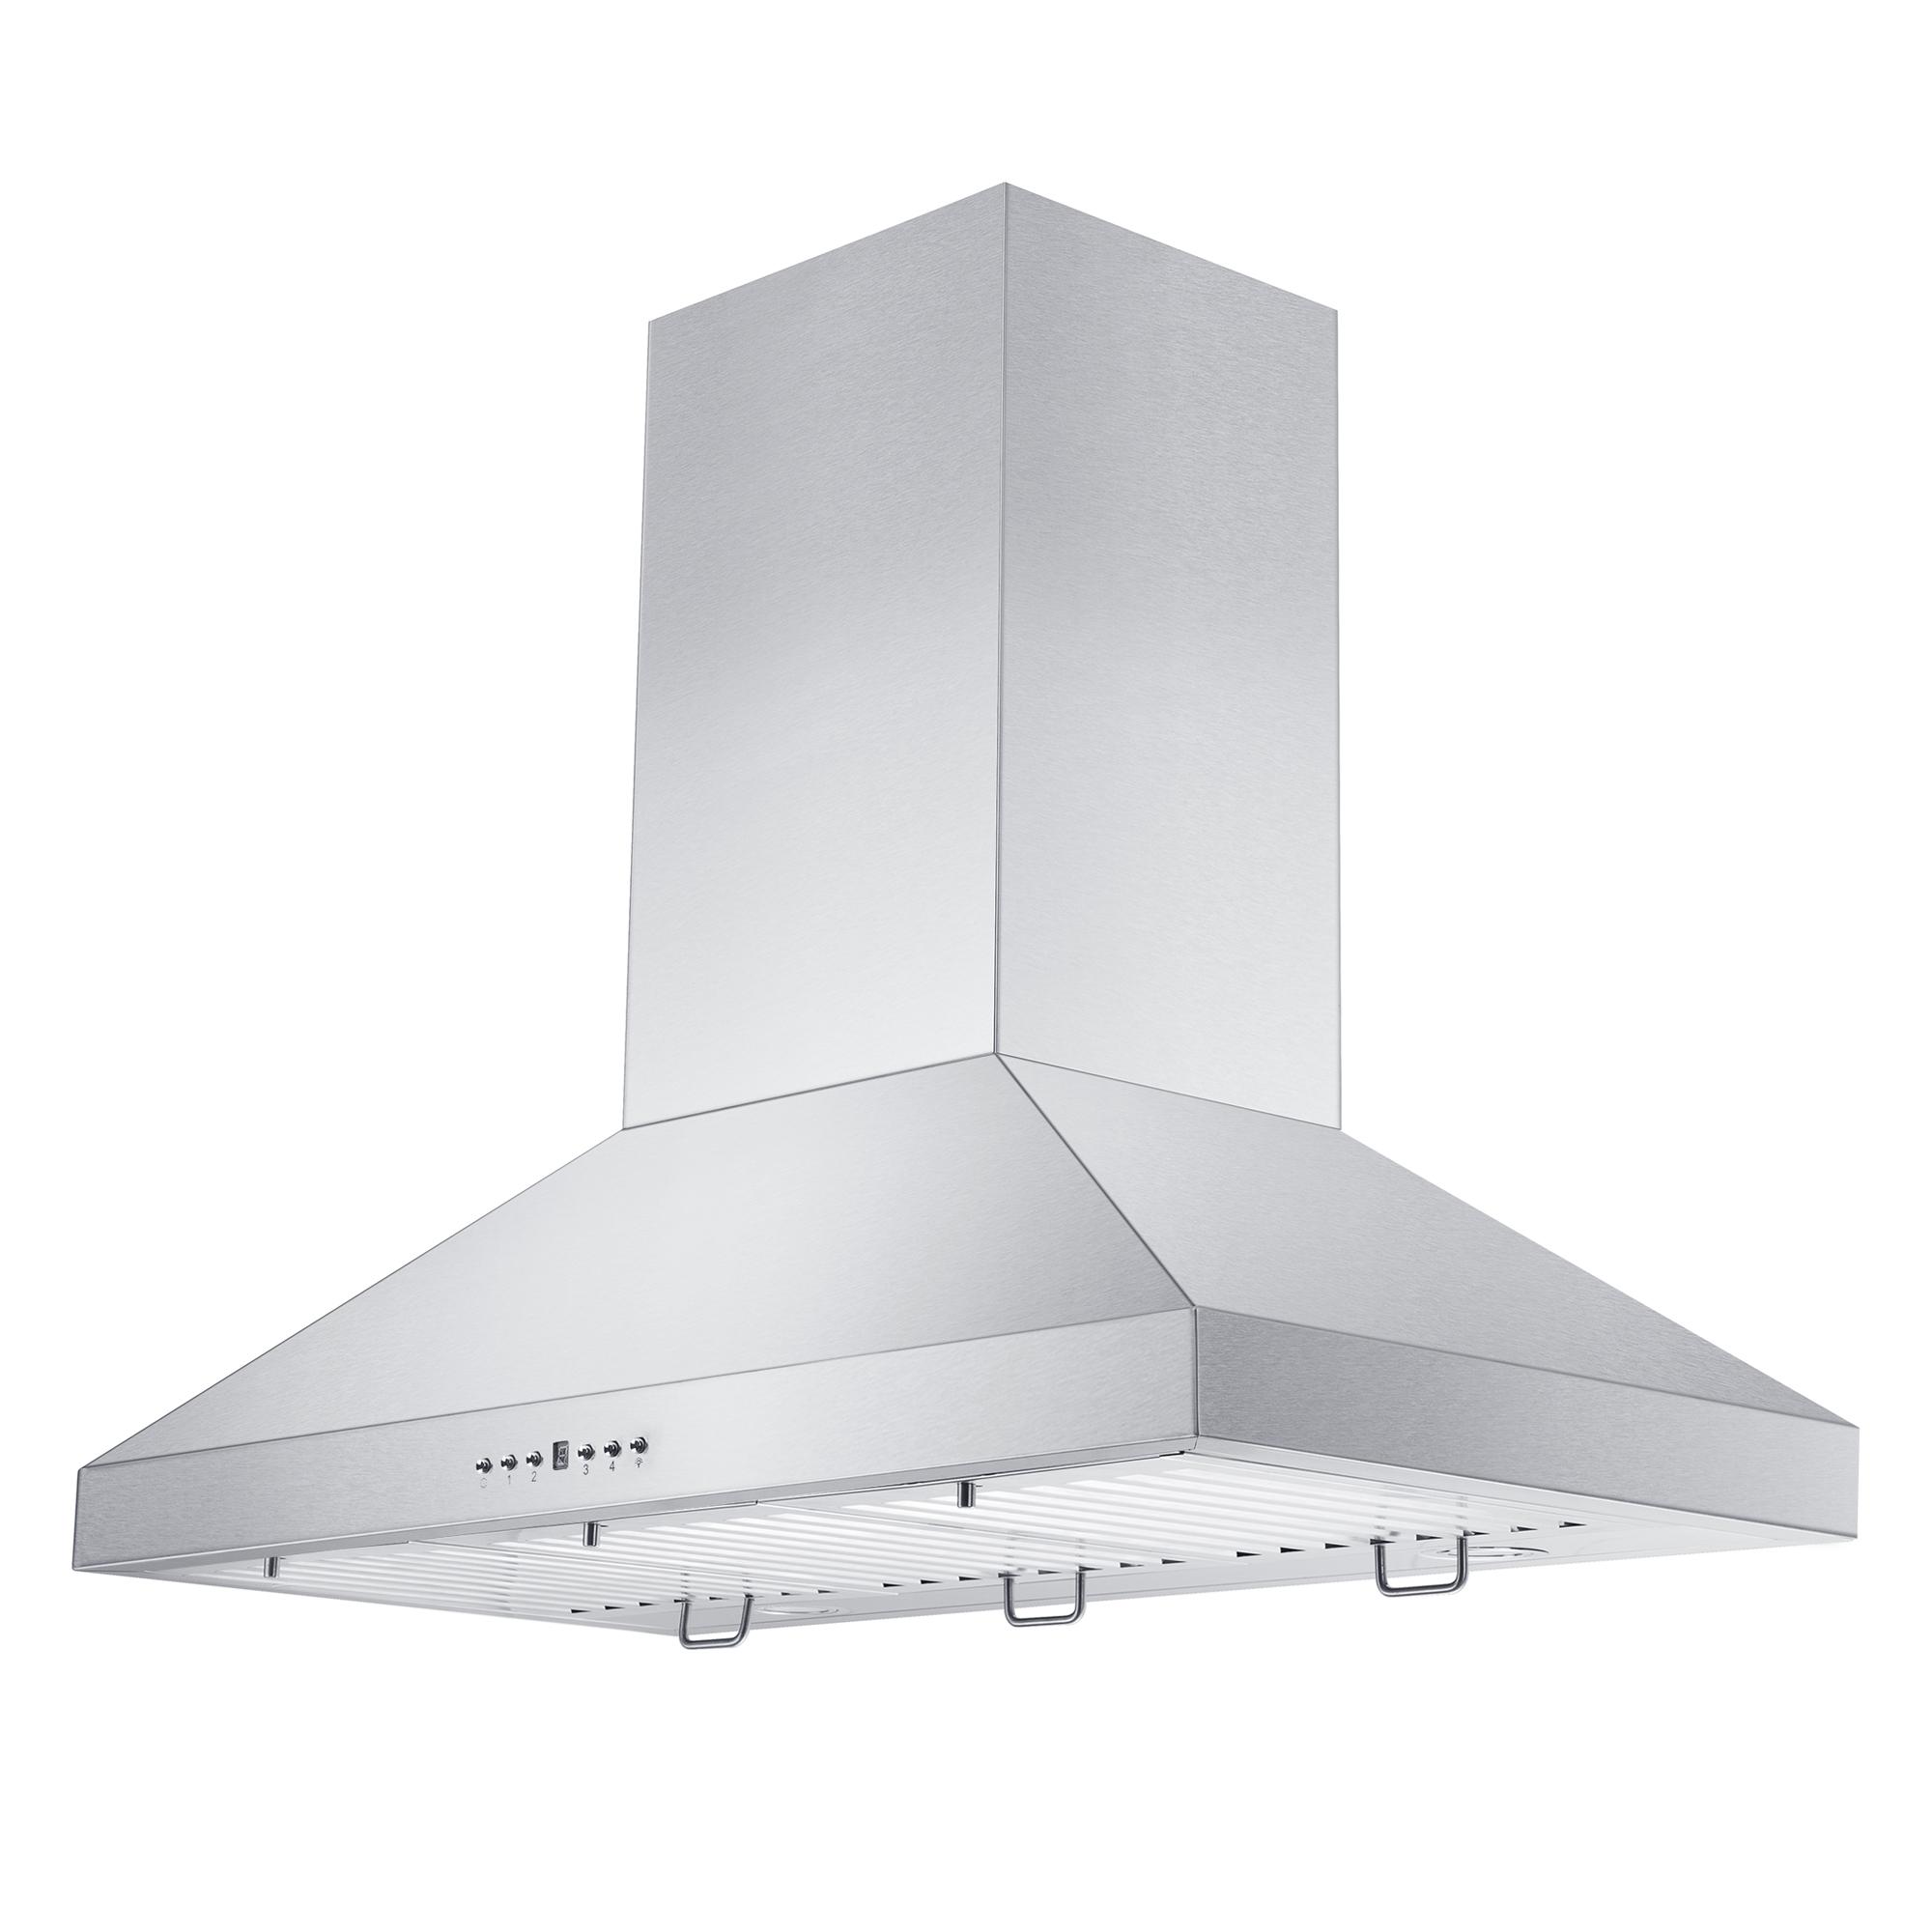 zline-stainless-steel-wall-mounted-range-hood-KL3-new-side-under.jpg